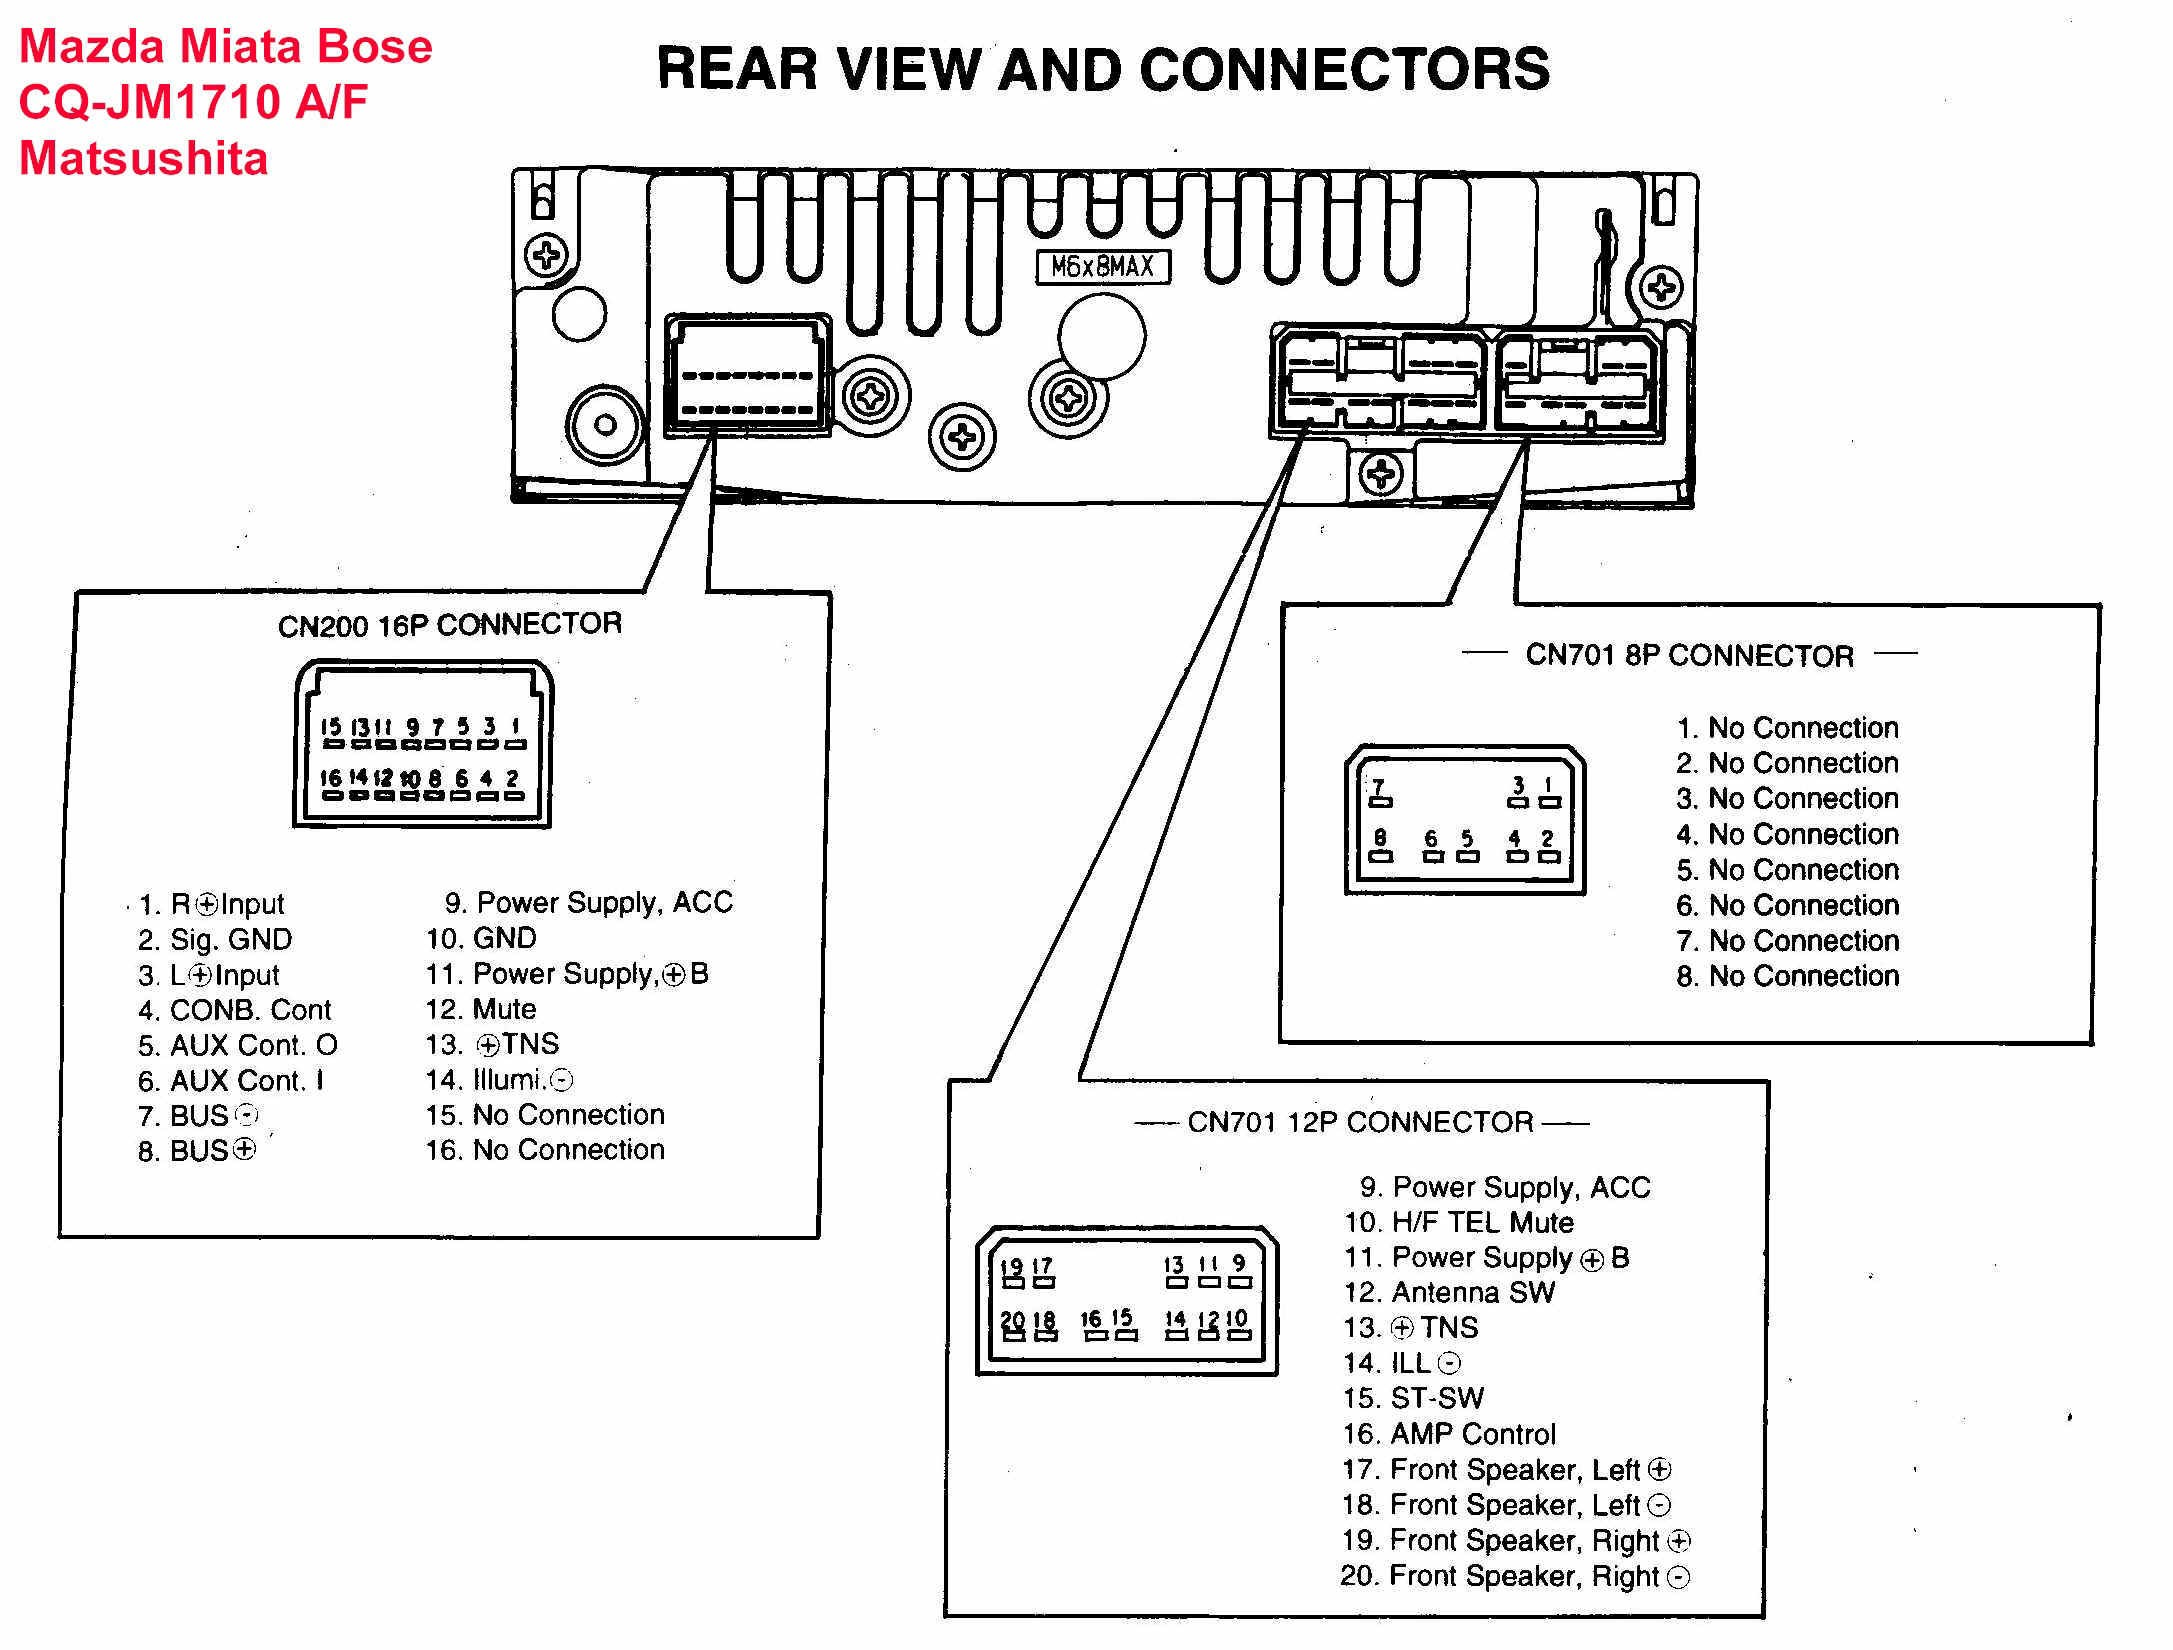 Sony Car Stereo Wiring Diagram Factory Car Stereo Wiring Diagrams In Jpg Unbelievable Wiring Of Sony Car Stereo Wiring Diagram